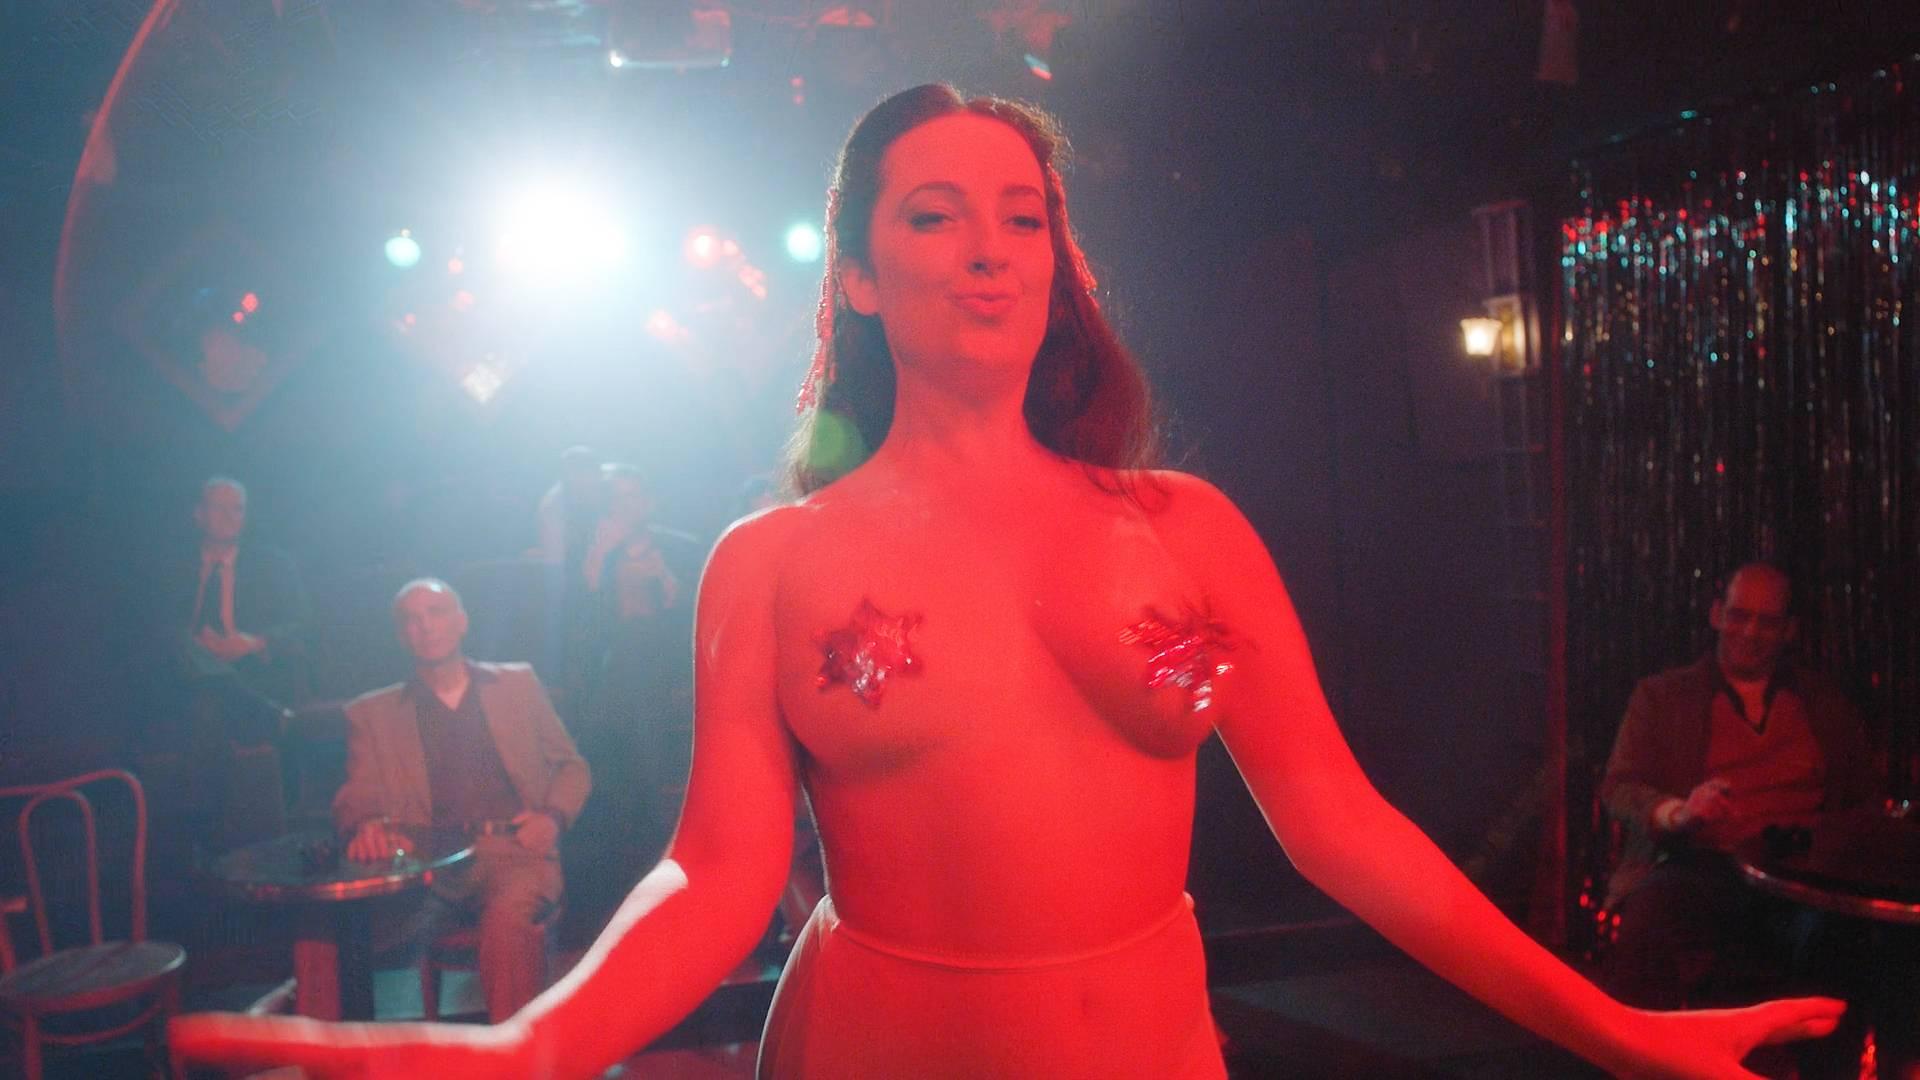 Rachel-Brosnahan-nude-topless-and-butt-Kyla-Walker-hot-The-Marvelous-Mrs-Maisel-2017-s1e1-HD-1080p-00005.jpg